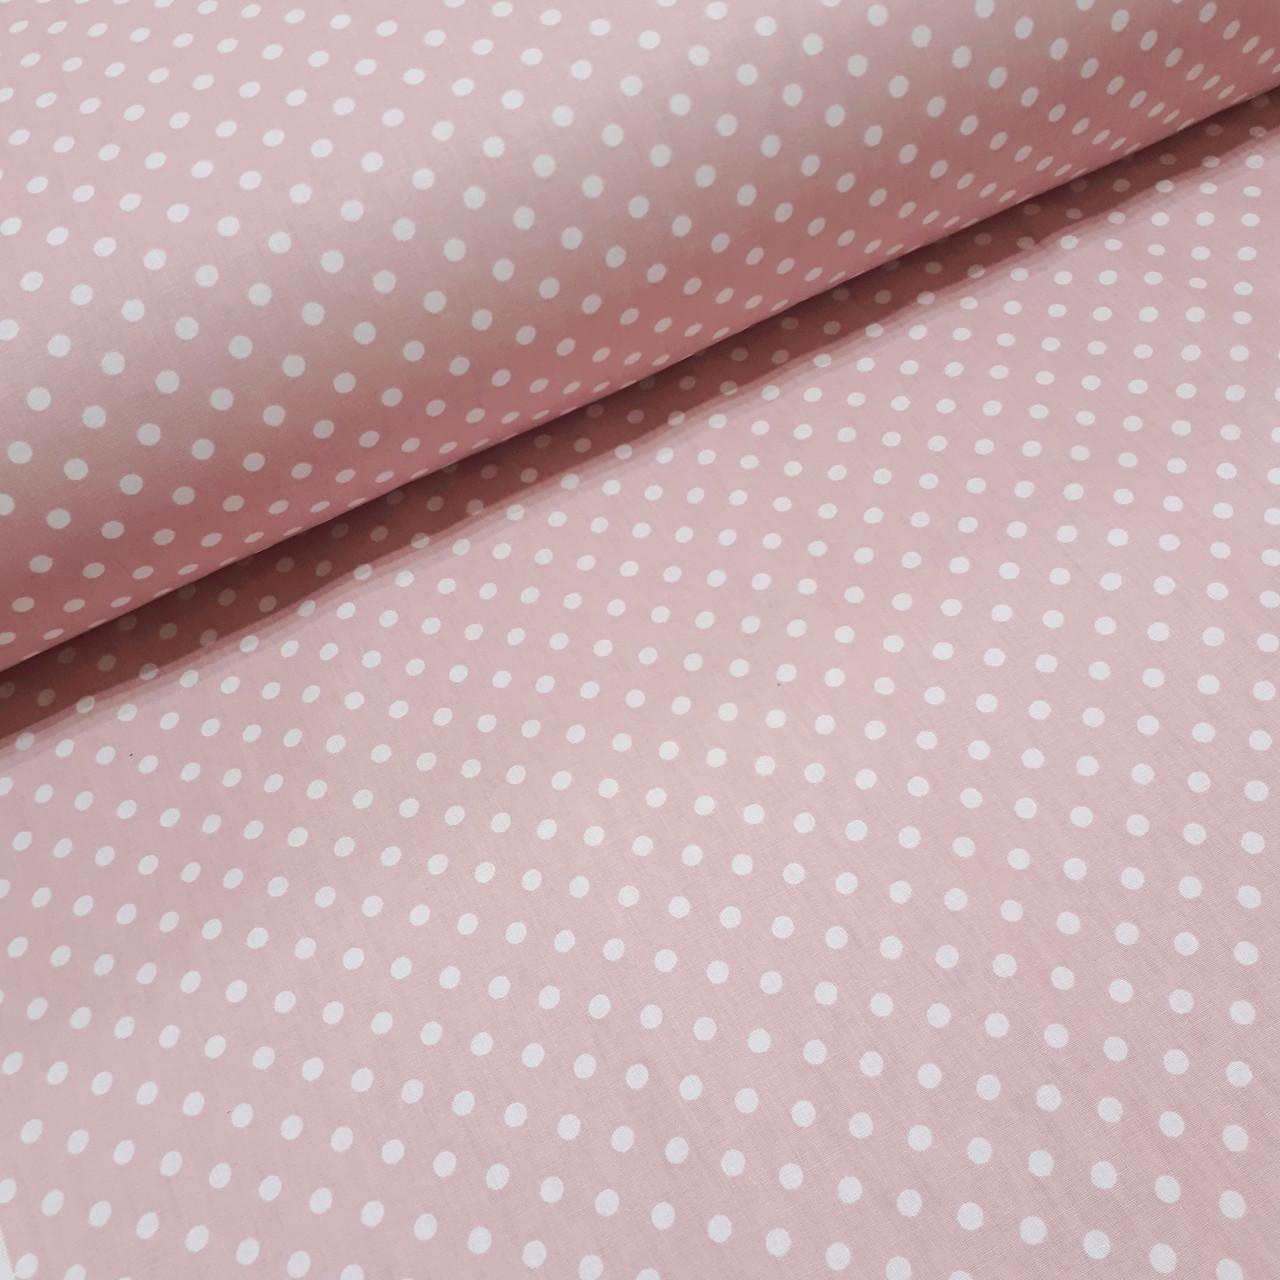 Ткань поплин с белым горошком на пудро-розовом 6мм (ТУРЦИЯ шир. 2,4 м) №32-54